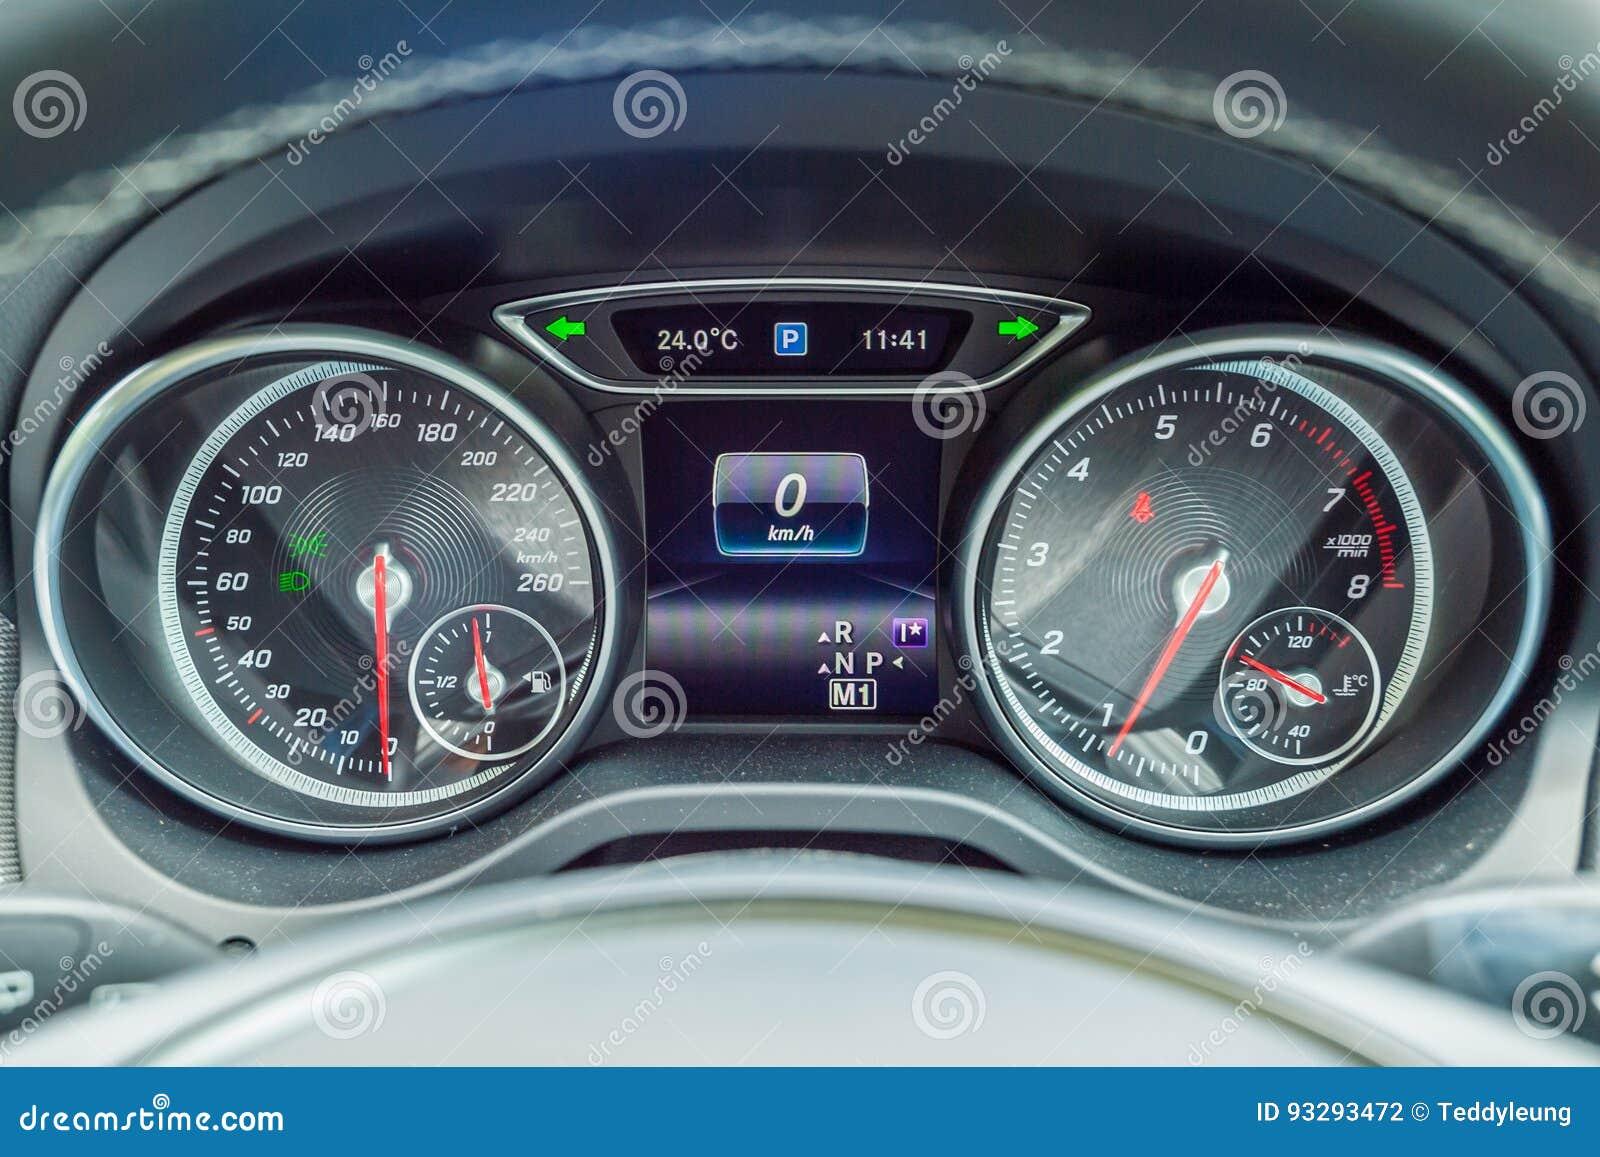 Armaturenbrett mercedes  Armaturenbrett Mercedes-Benzs GLA 200 Redaktionelles Stockfotografie ...